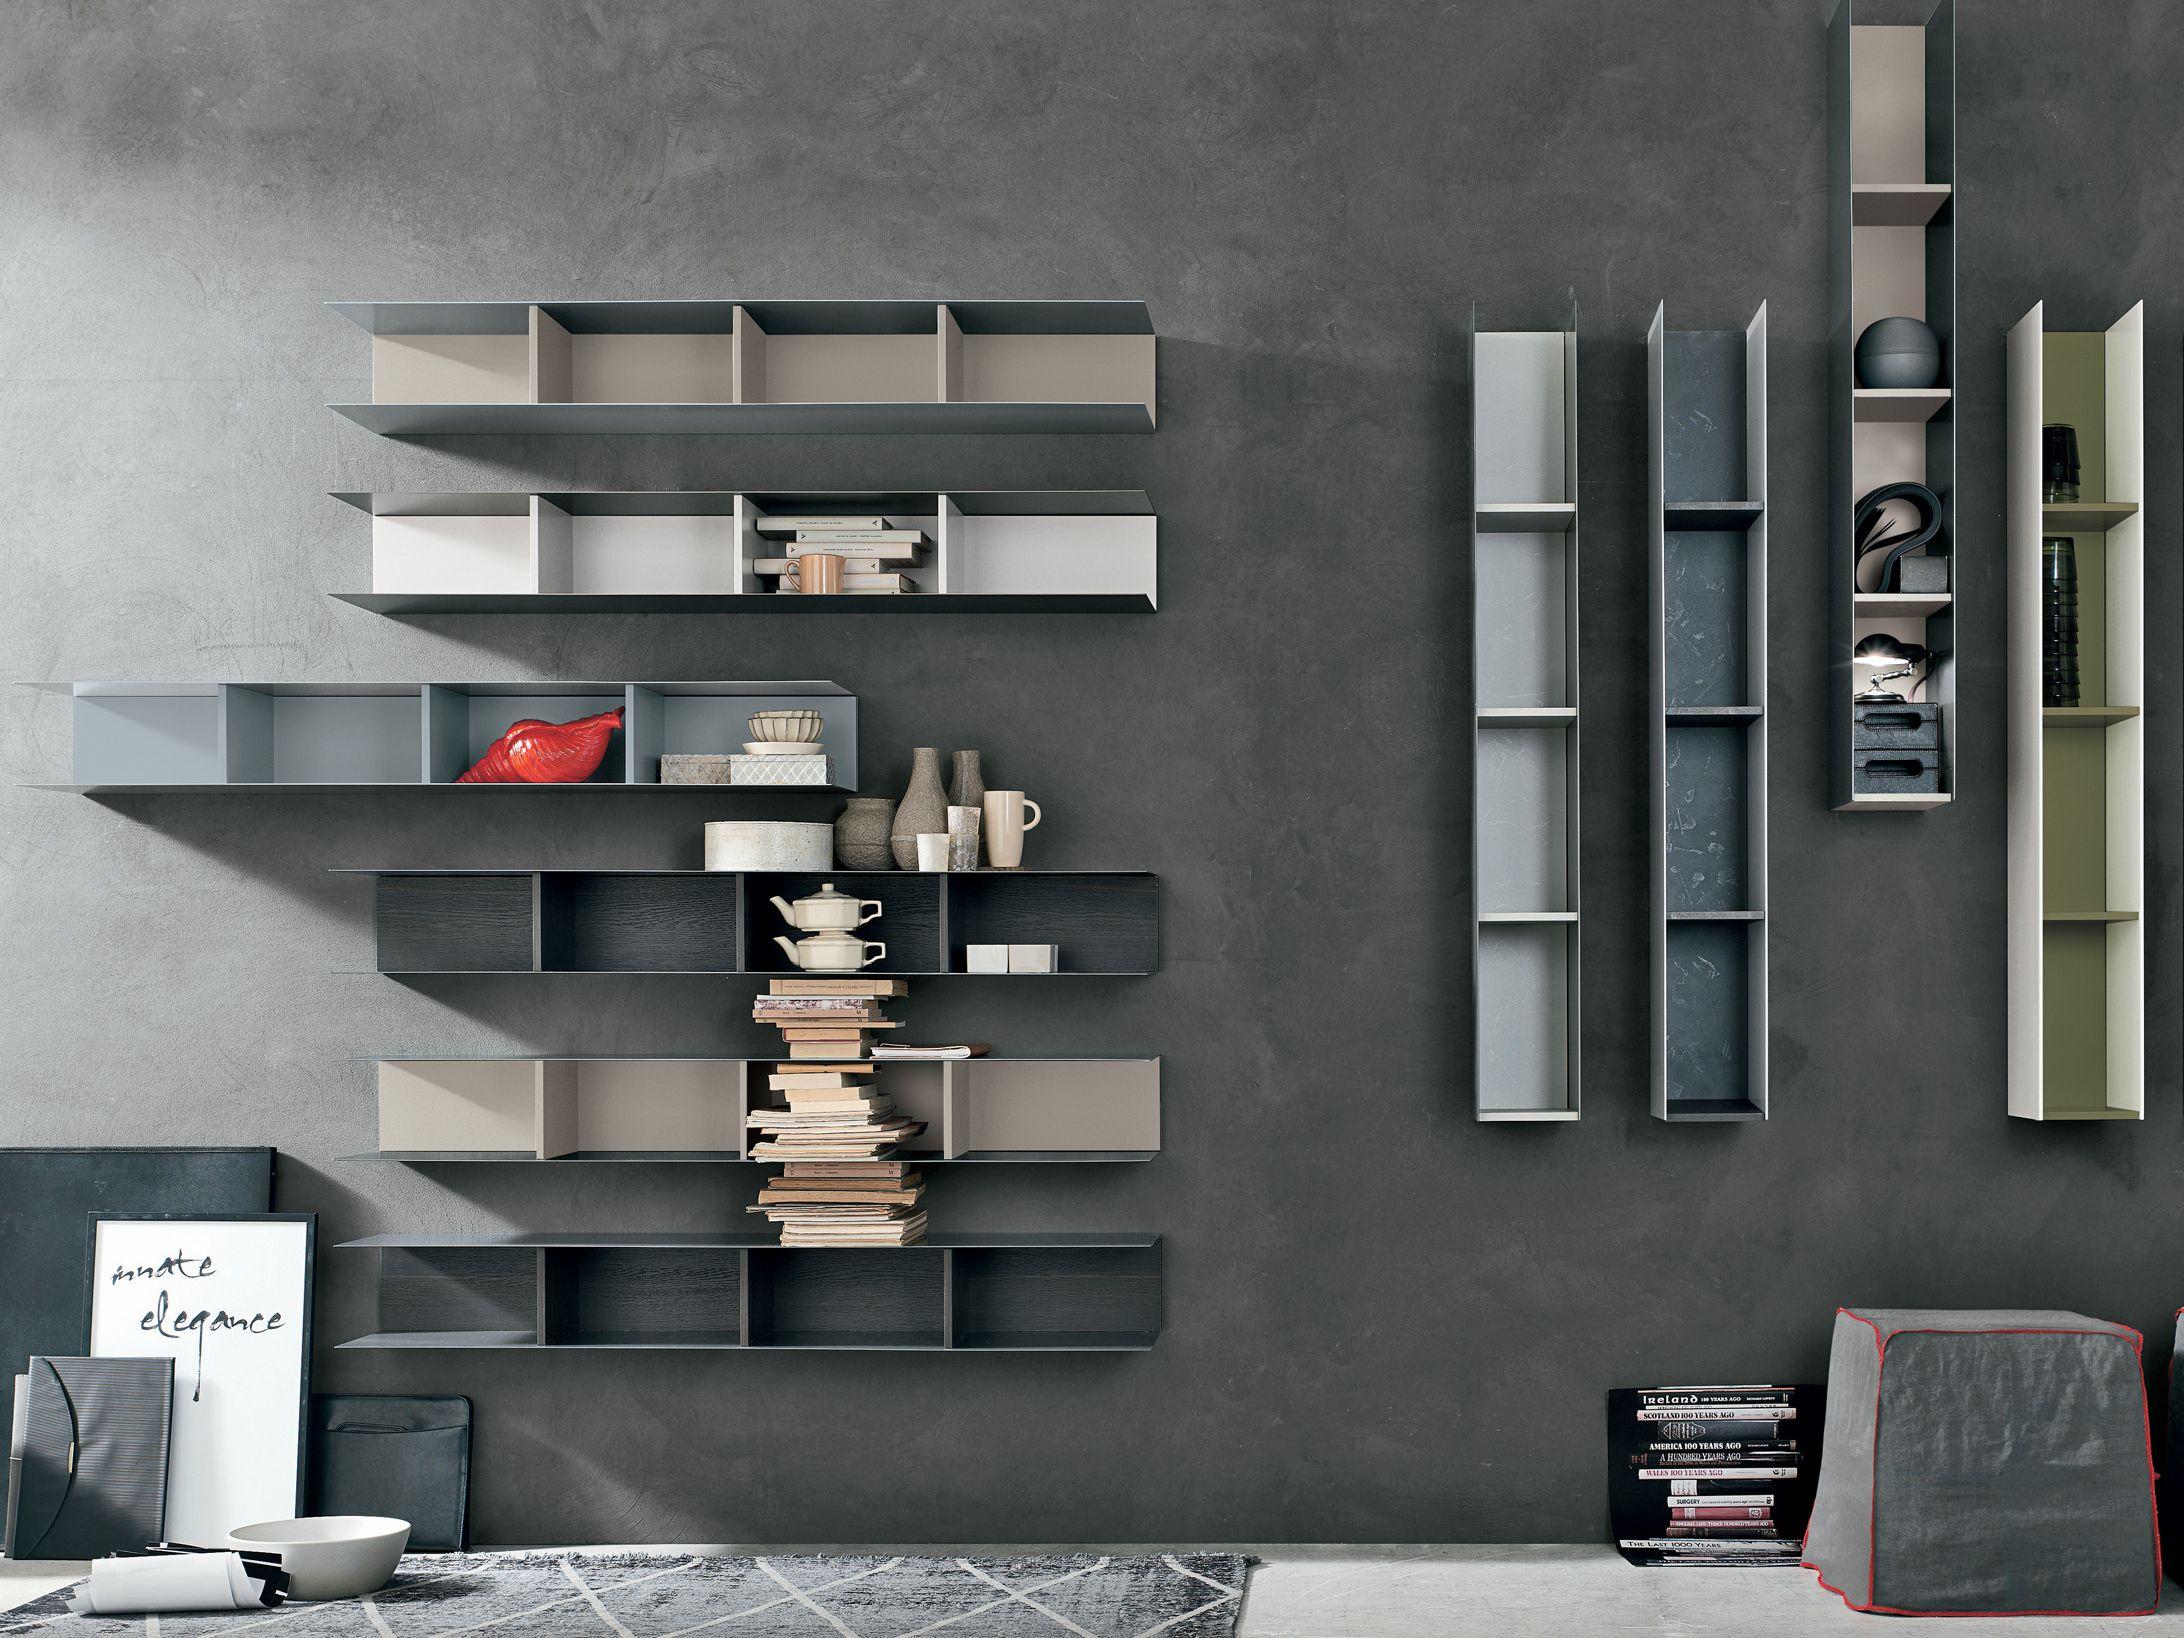 Raster Wall Shelf Raster Collection By Gruppo Tomasella Shelves Wall Shelves Open Shelving Units